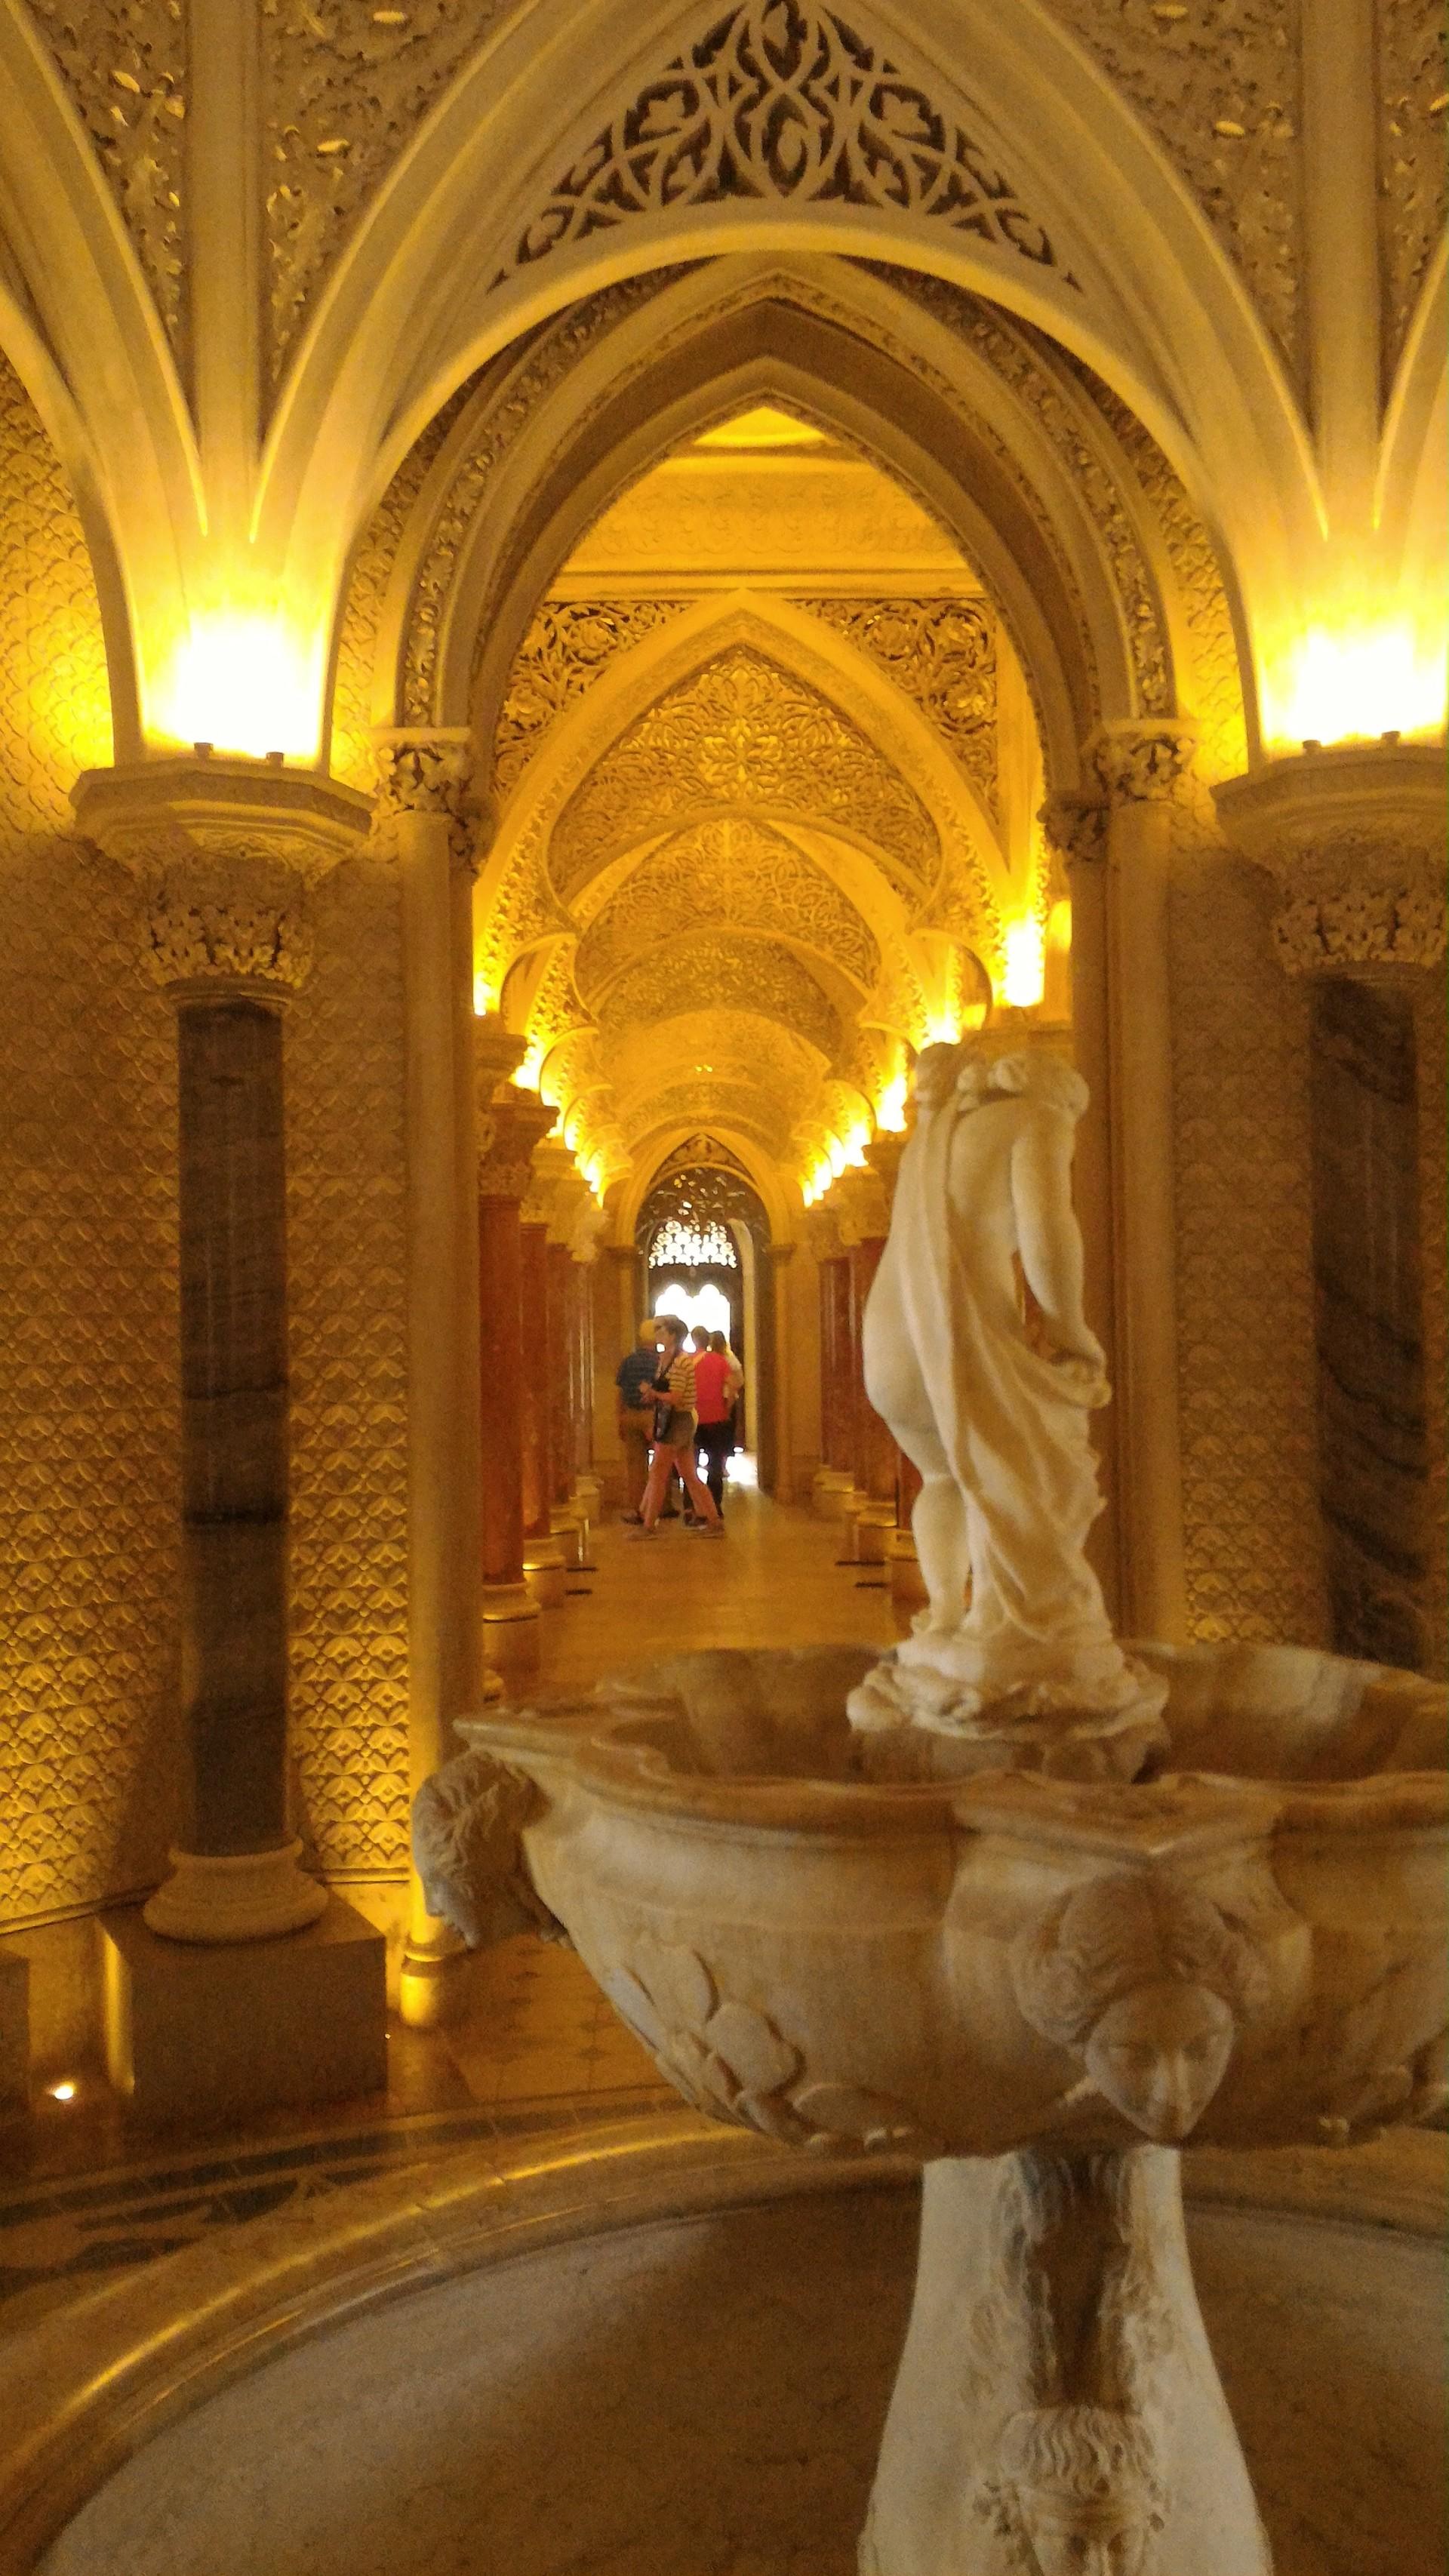 park-palace-monserrate-3e2eda9b158ee449d